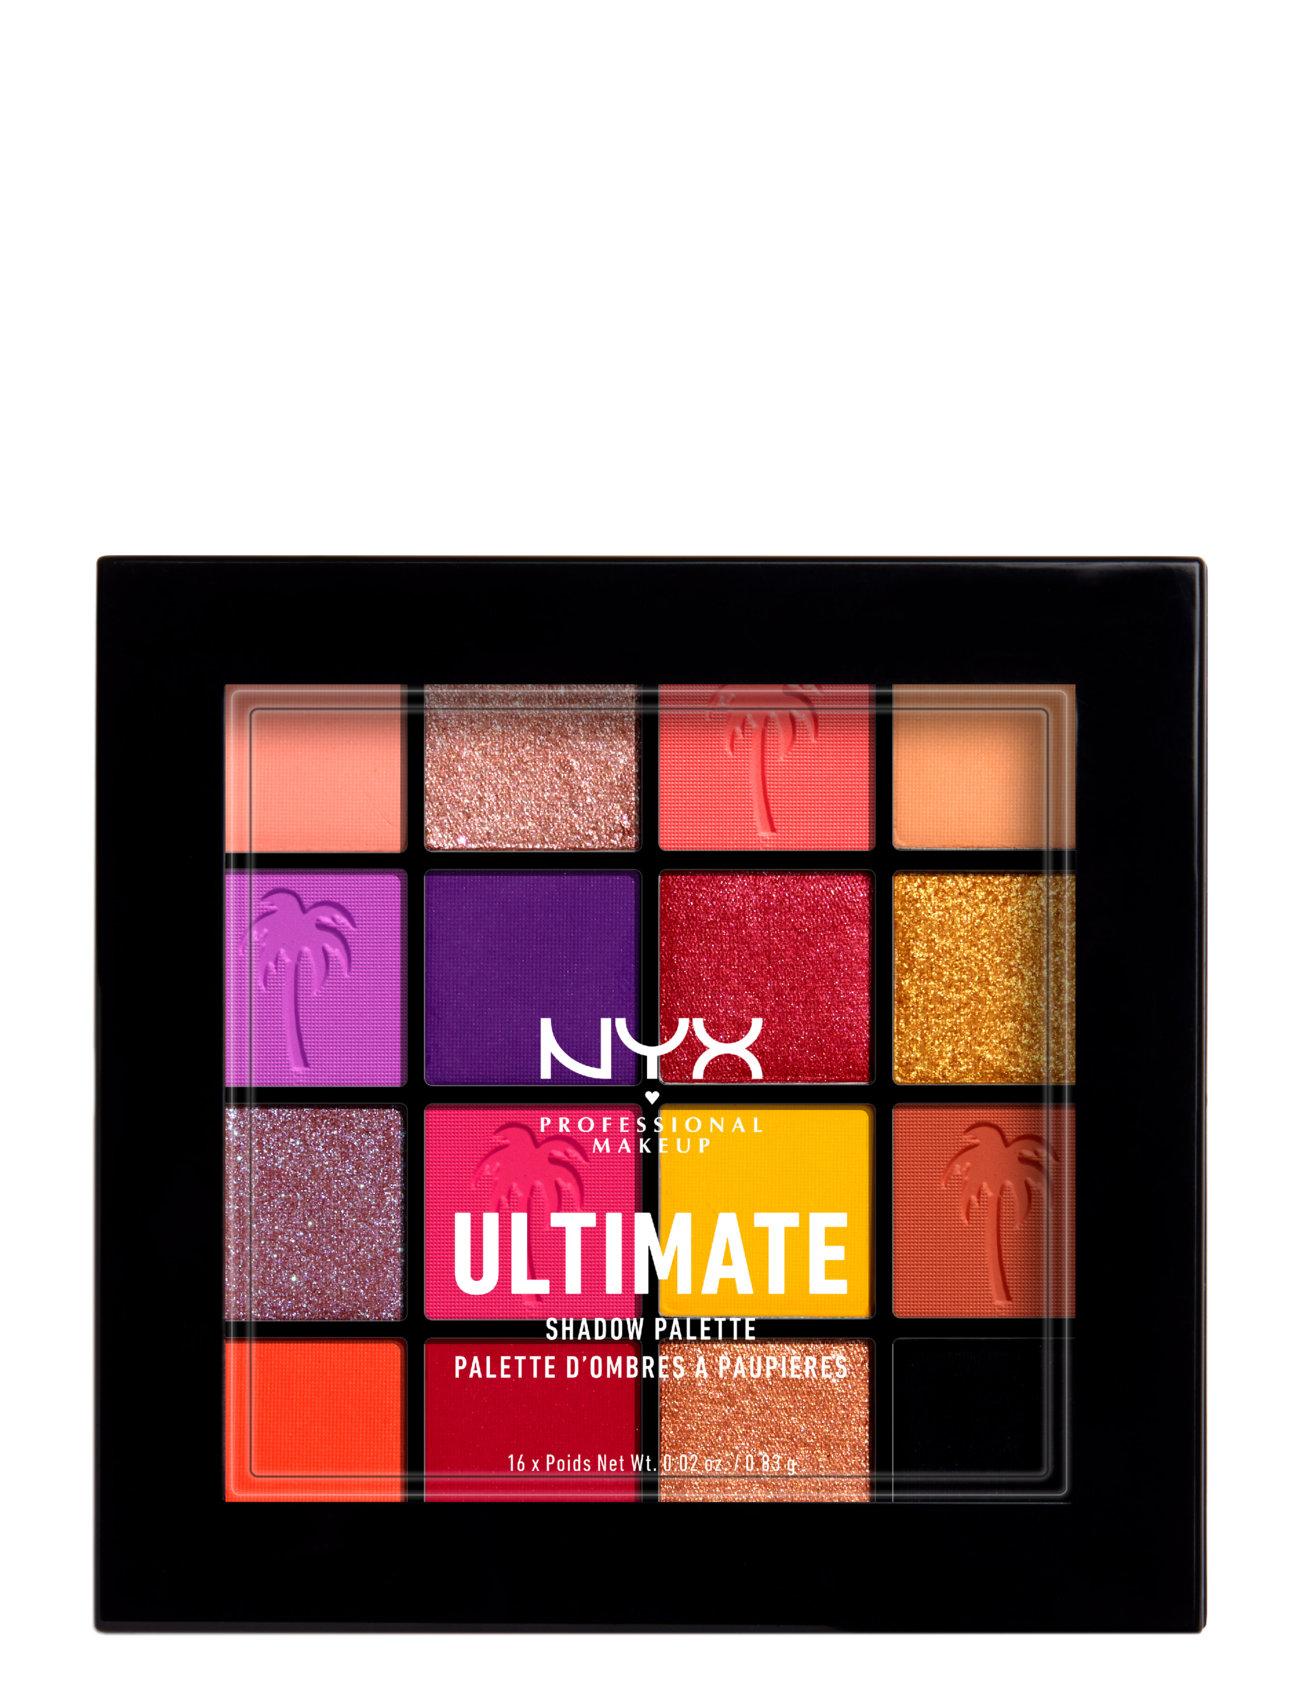 Ultimate Shadow Palette Beauty WOMEN Makeup Eyes Eyeshadow Palettes Multi/mønstret NYX PROFESSIONAL MAKEUP